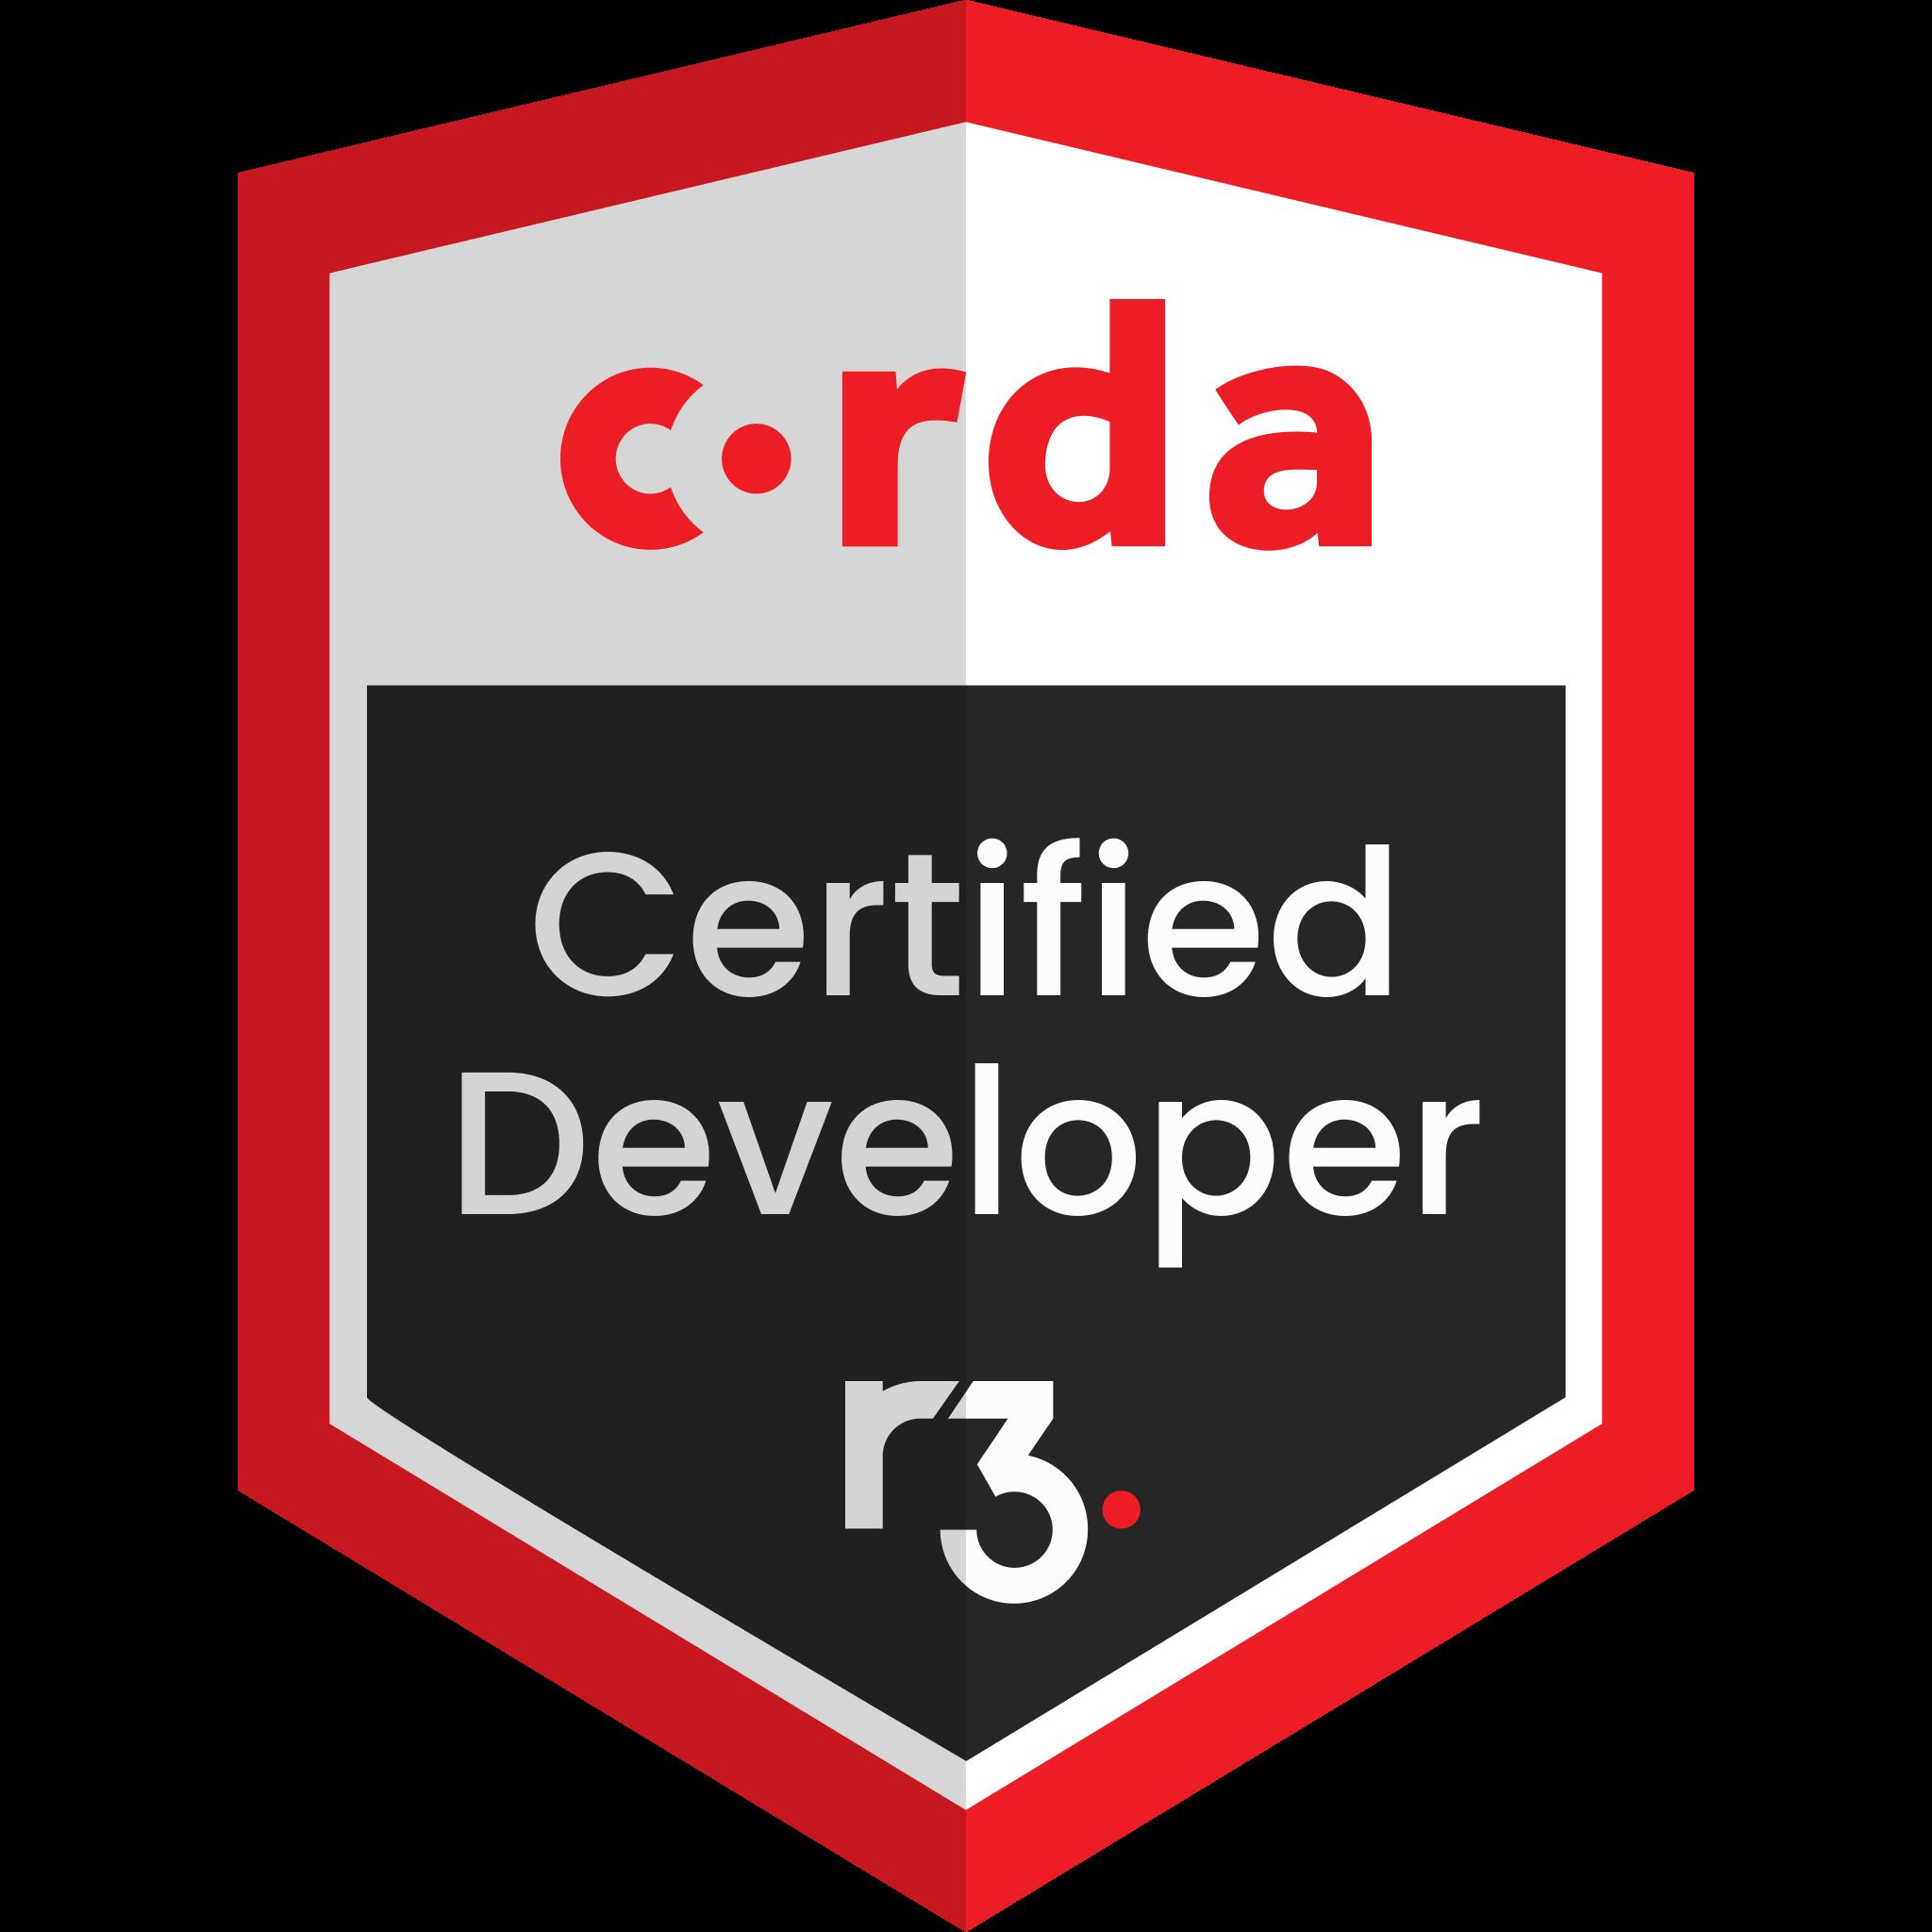 Corda Certified Developer